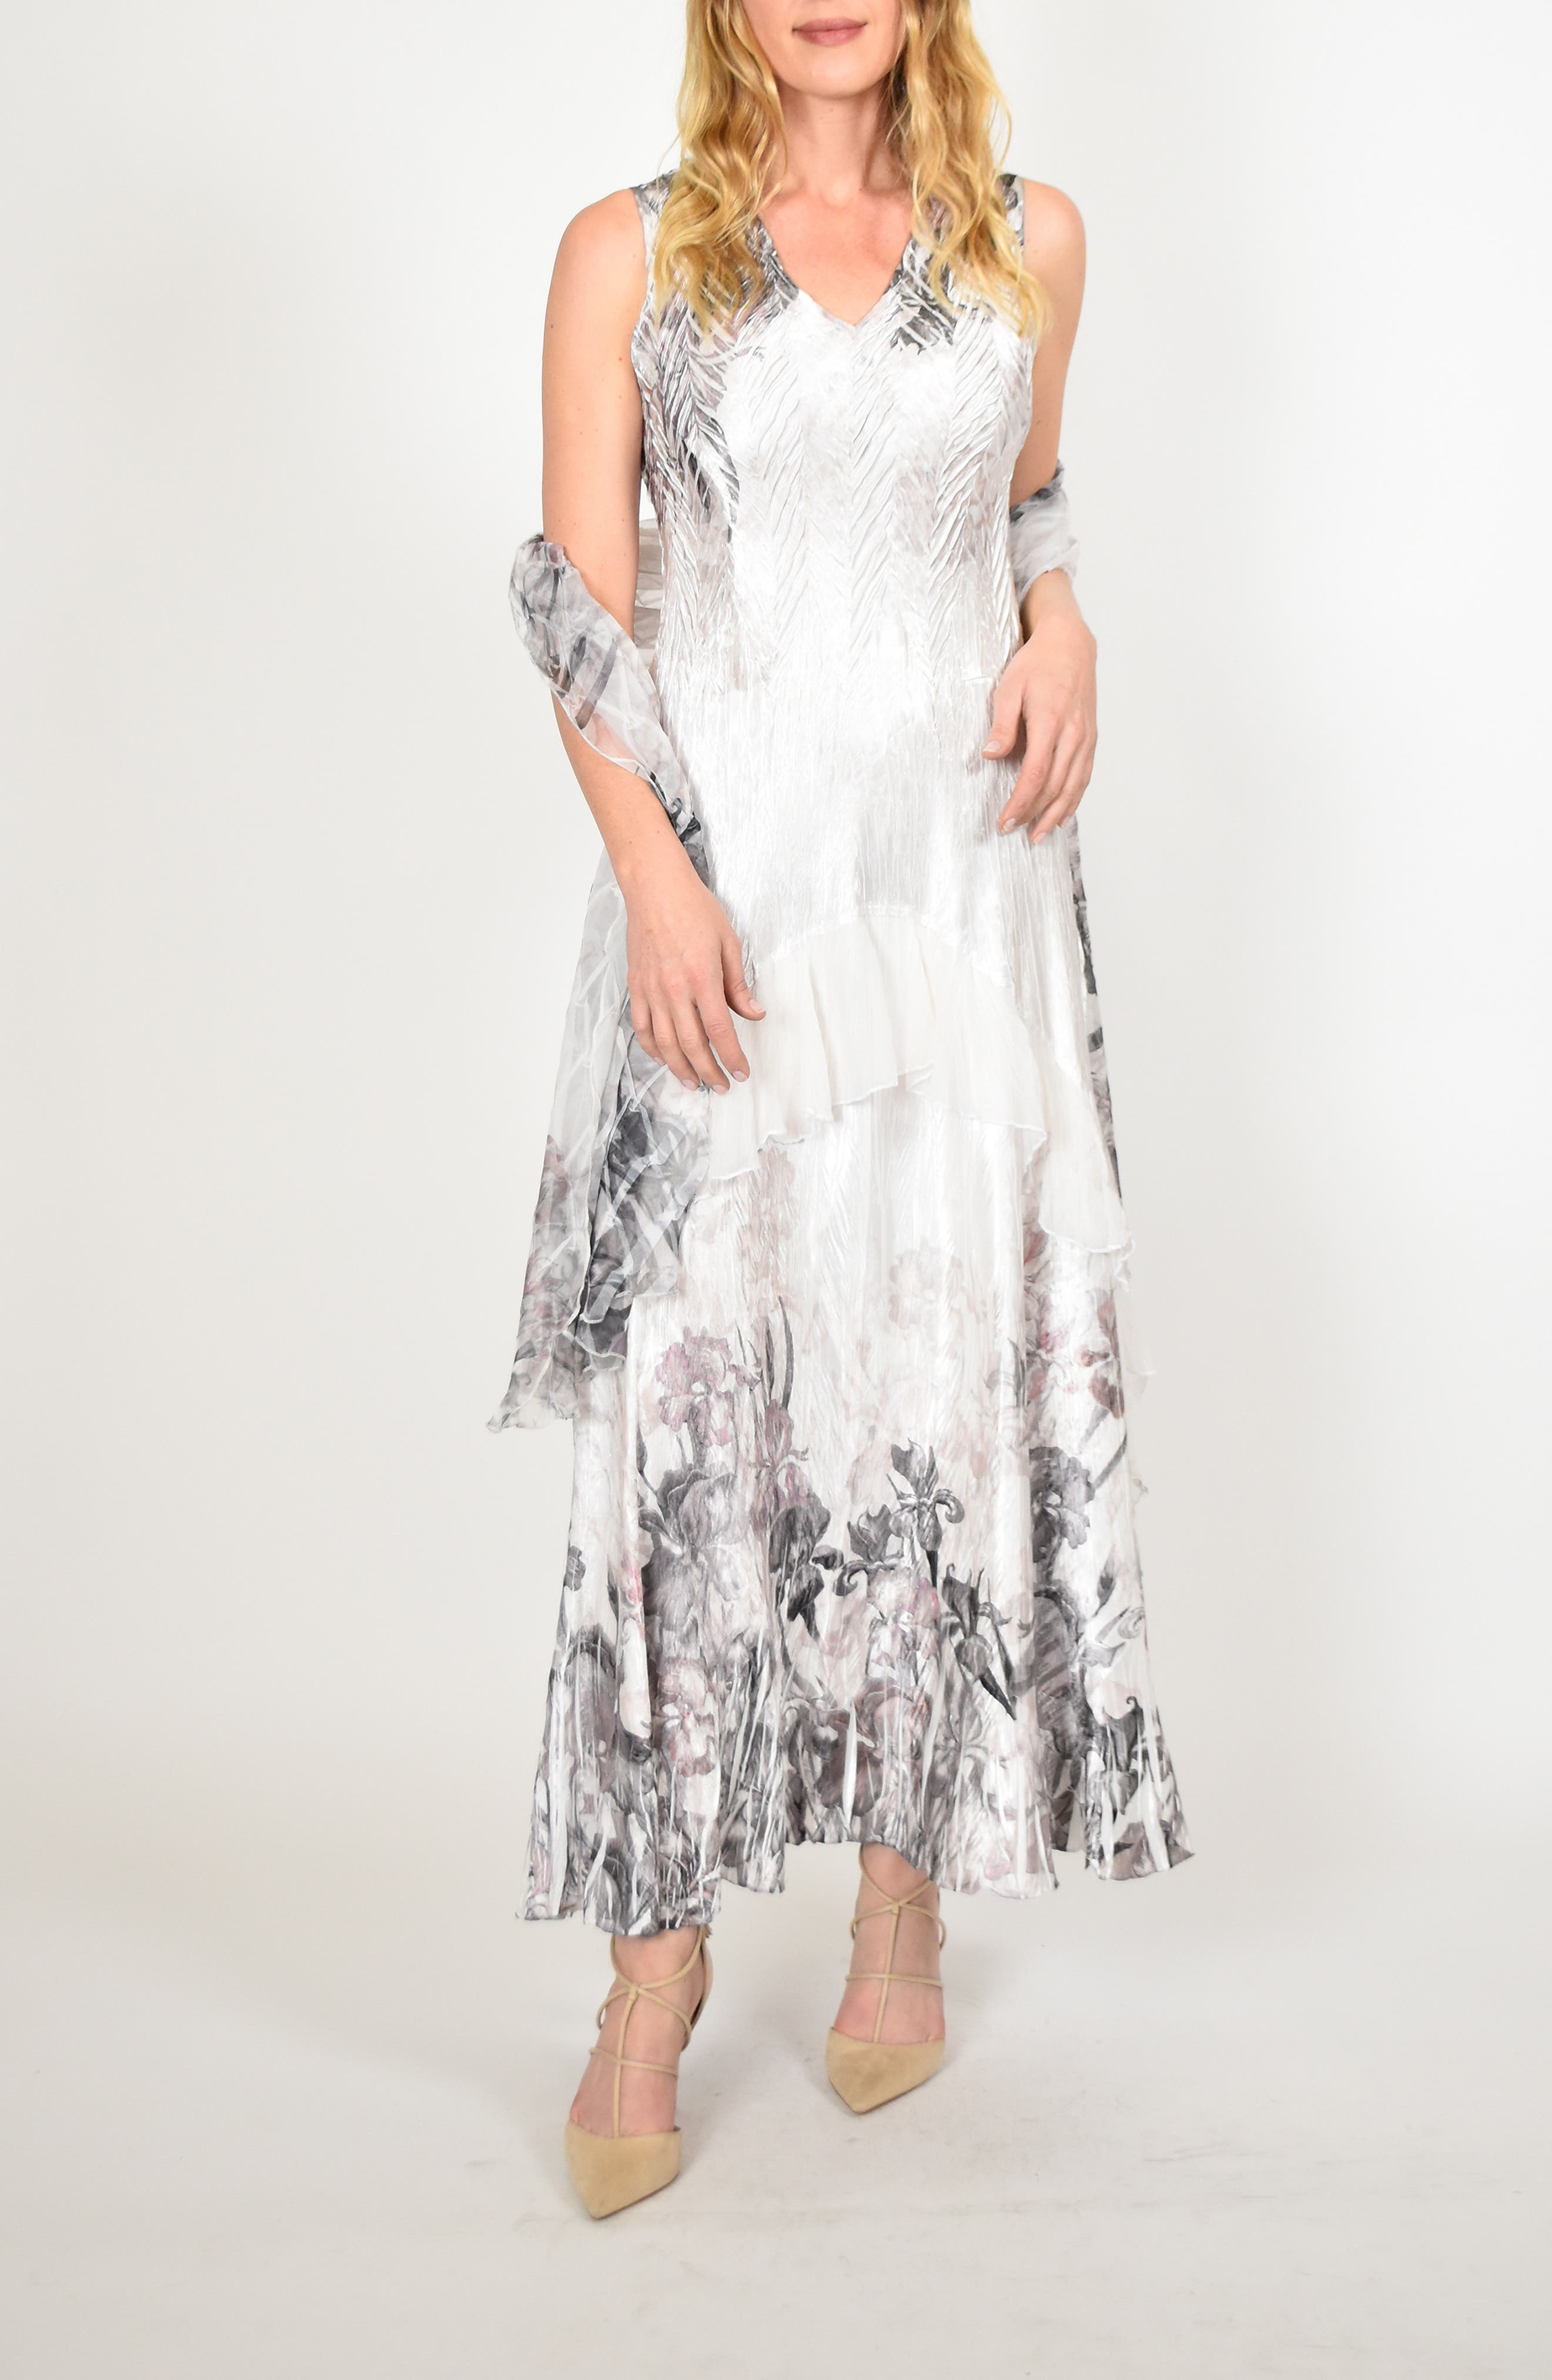 KOMAROV Charmeuse Dress with Wrap, Main, color, IRIS GARDEN